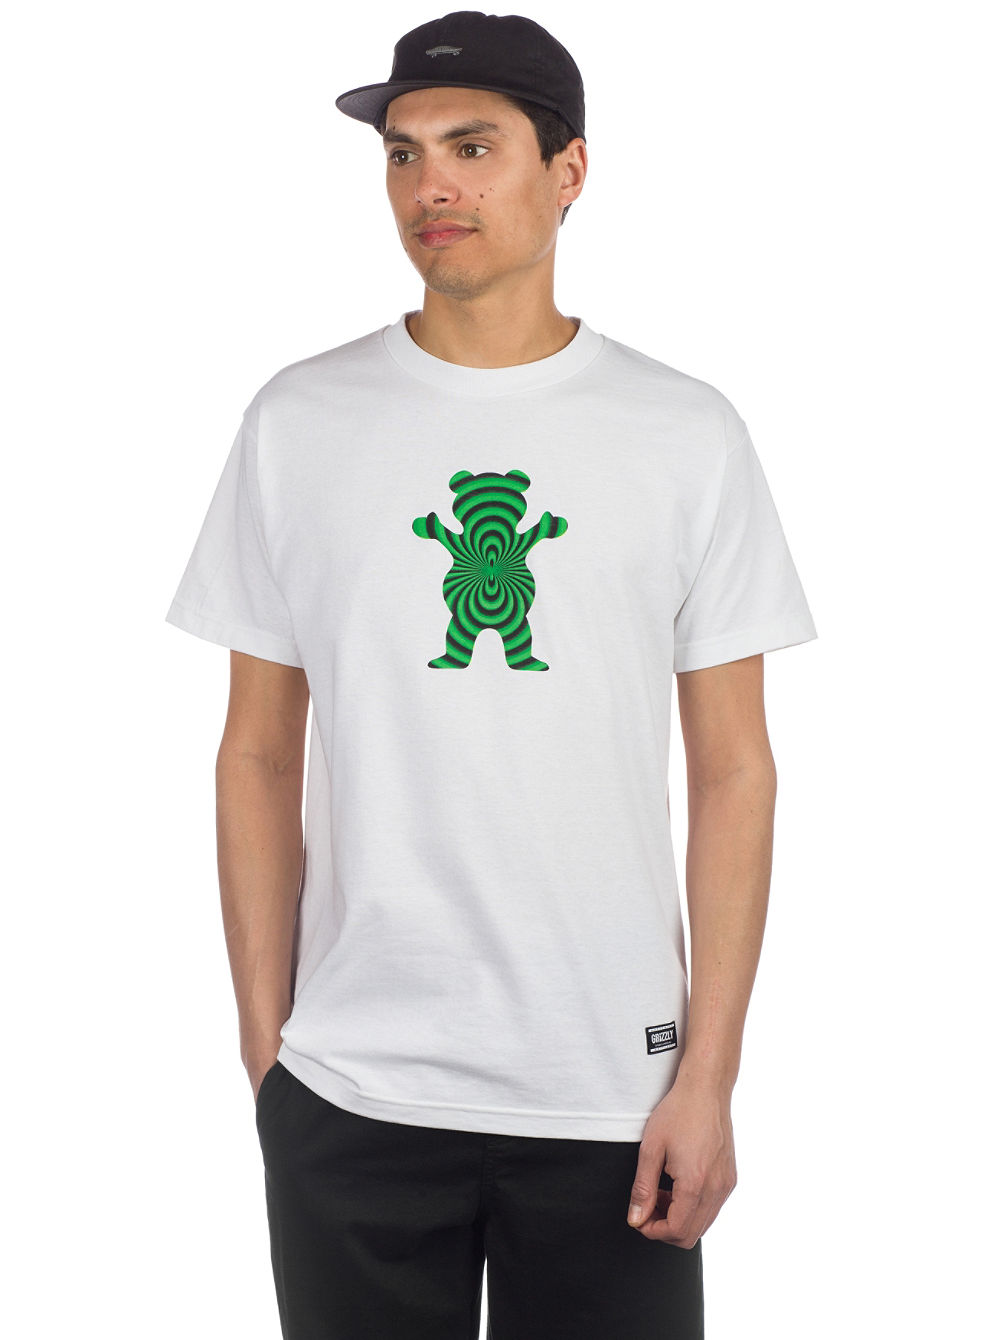 Achat Grizzly Warped Bear T-shirt En Ligne